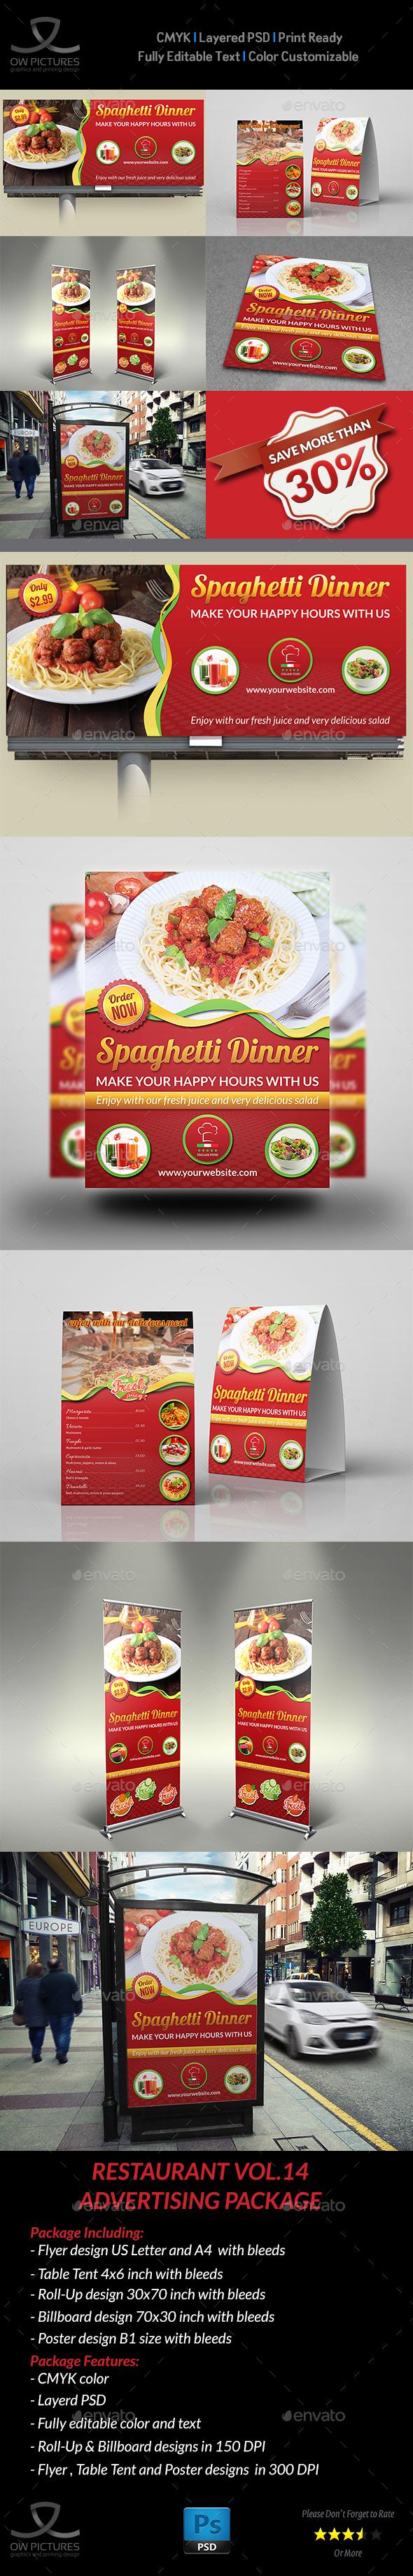 Restaurant Advertising Bundle Vol.2 - Signage Print Templates